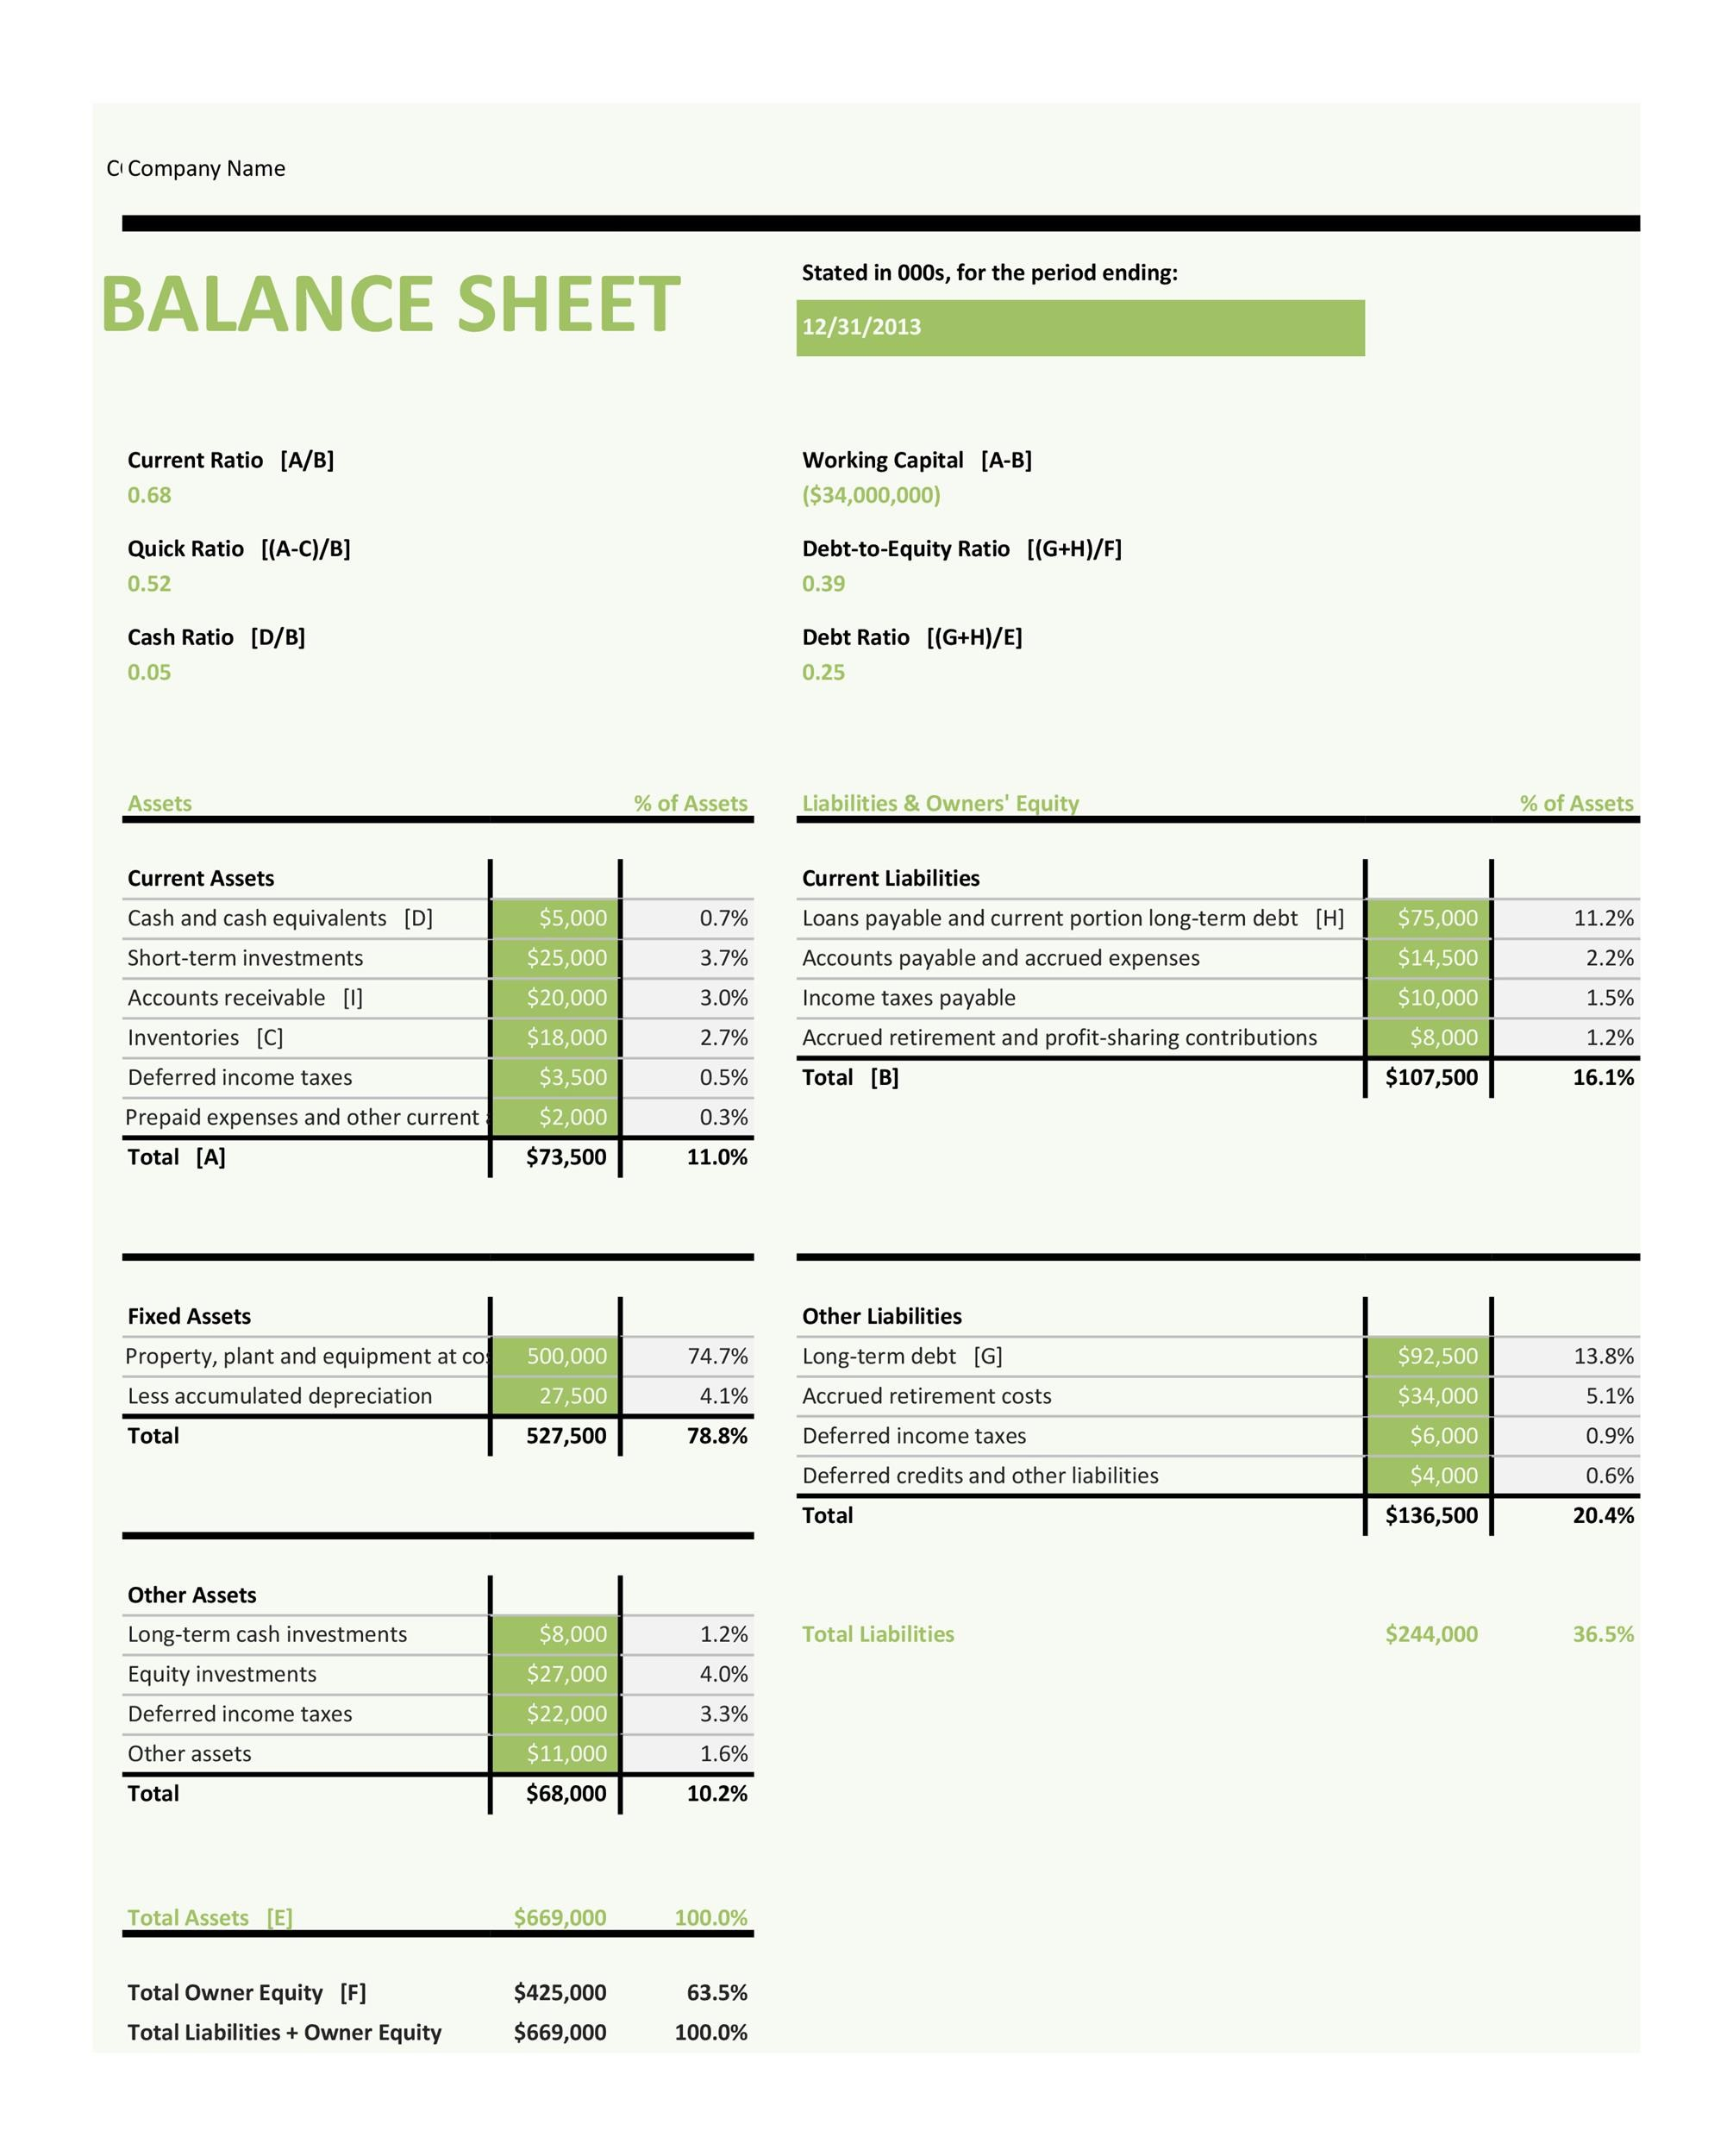 Trial Balance Sheet Template blank balance sheet balance sheet – Balance Sheet Preparation Examples